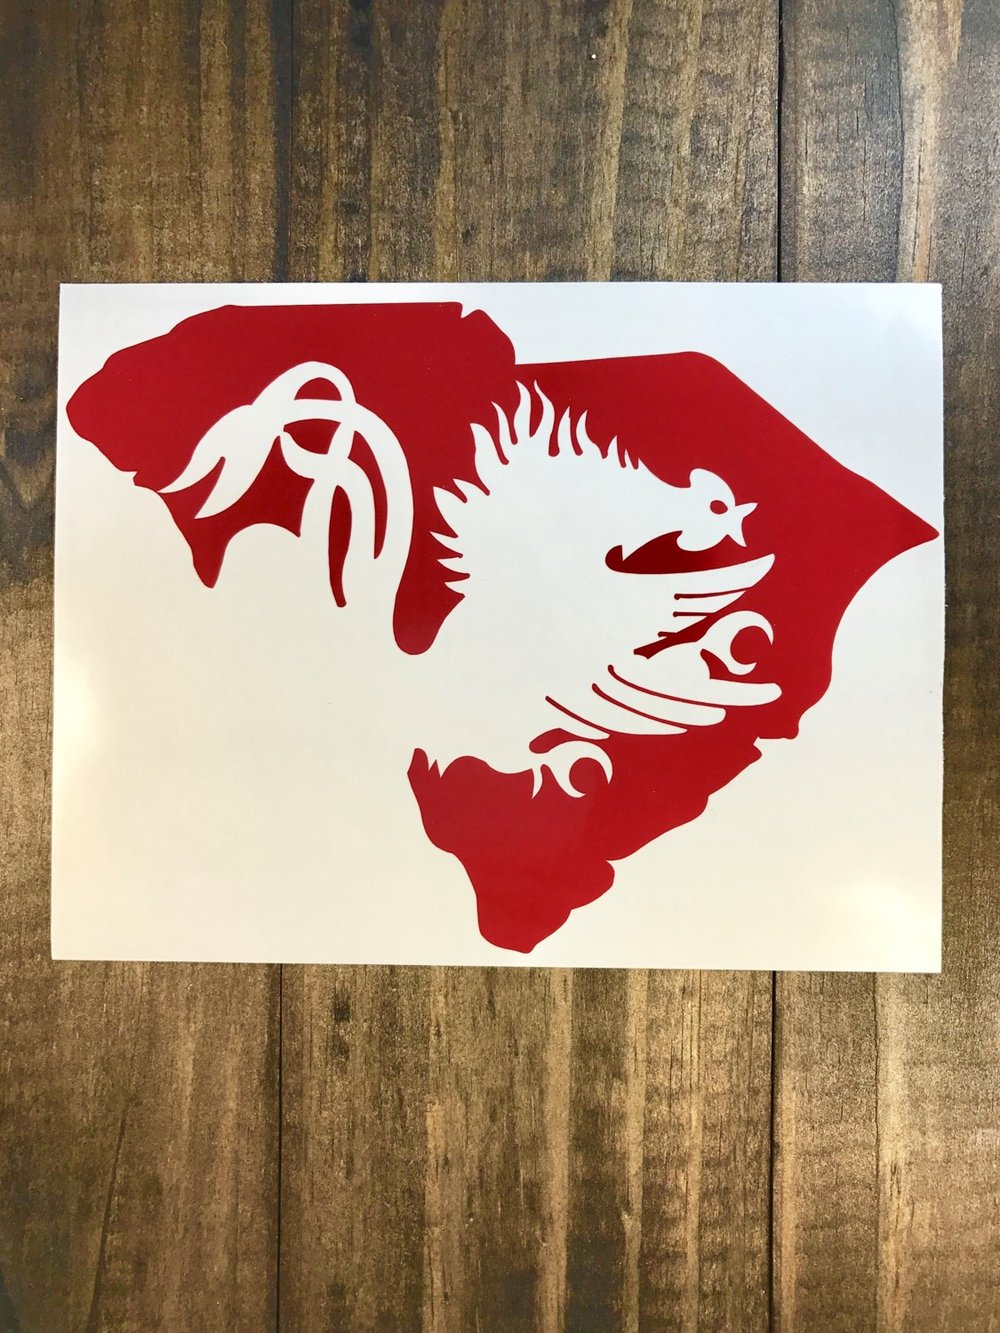 Carolina_State_Gamecock.jpg